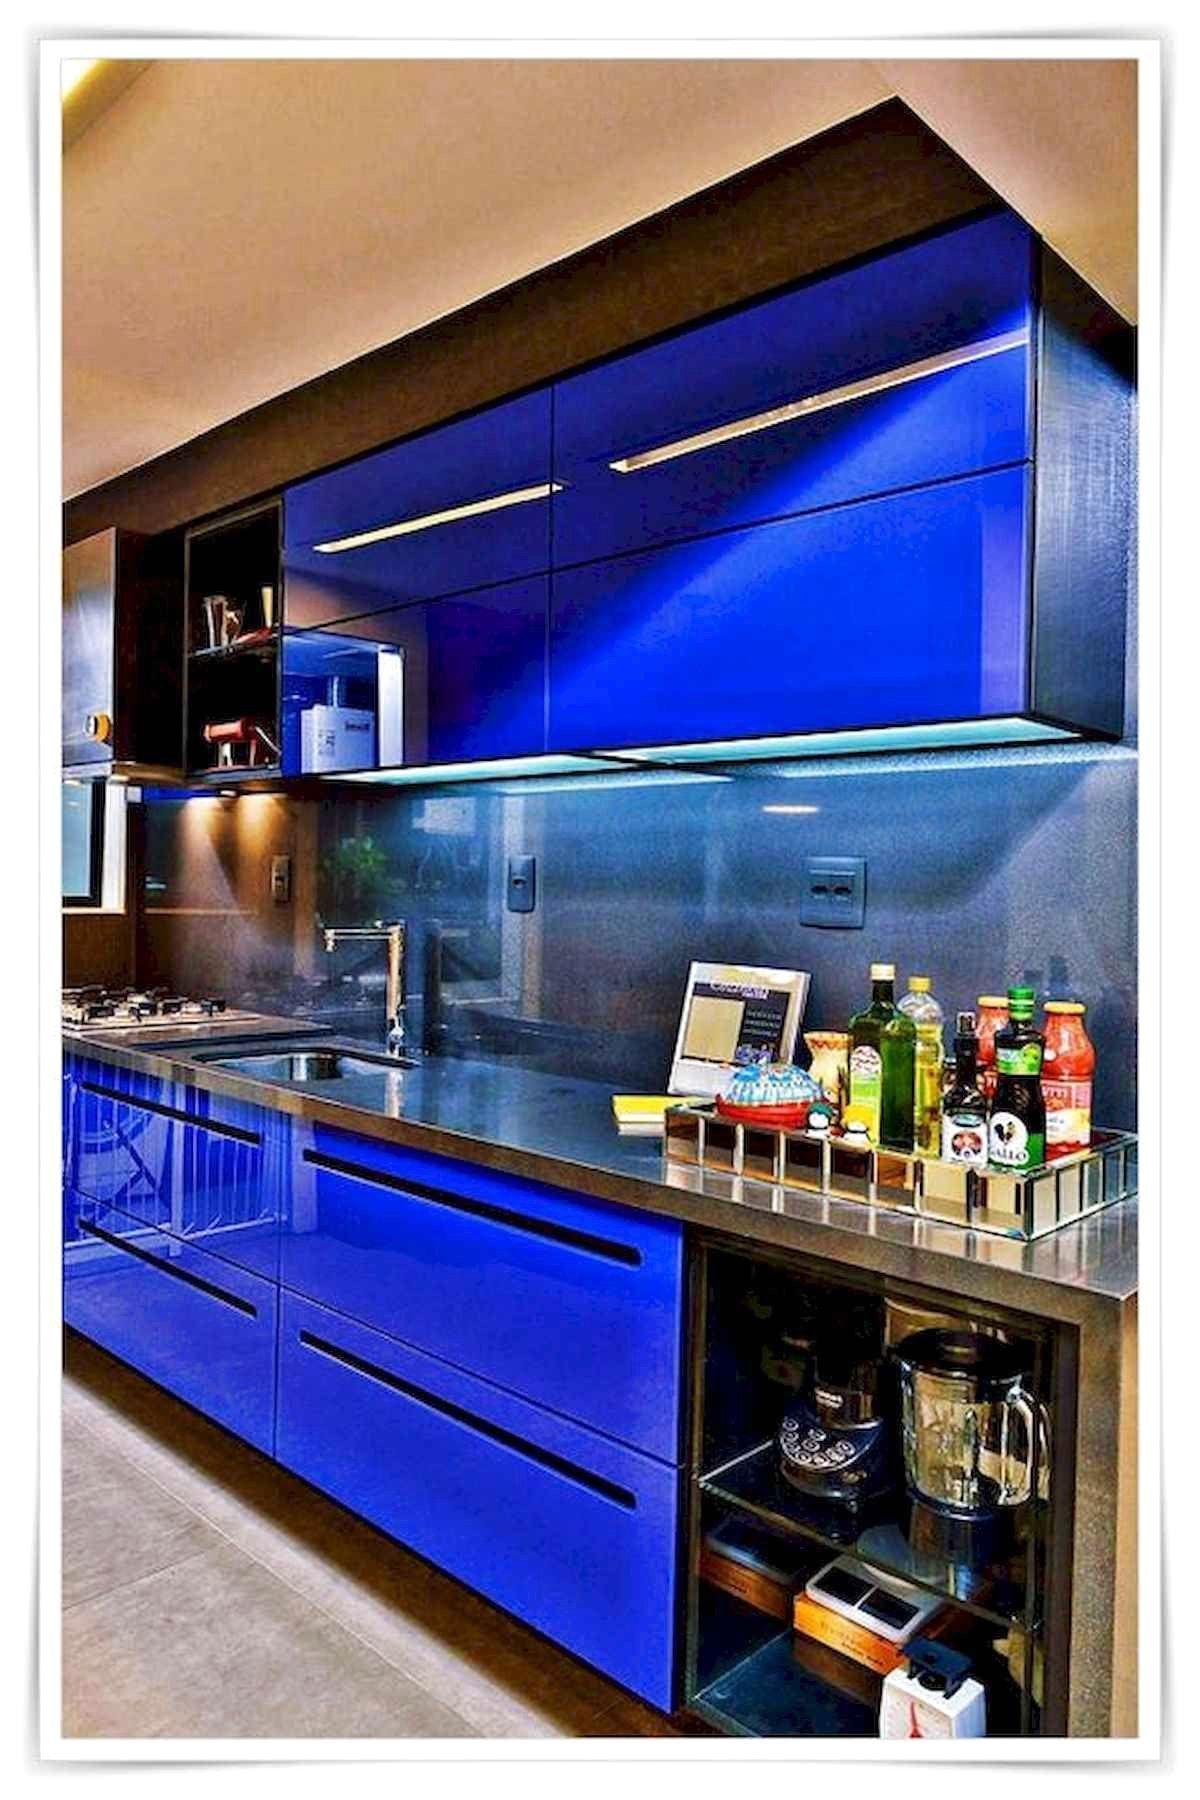 75 favorite colorful kitchen decor ideas and remodel for summer project colorful kitchen decor on kitchen ideas minimalist id=46124